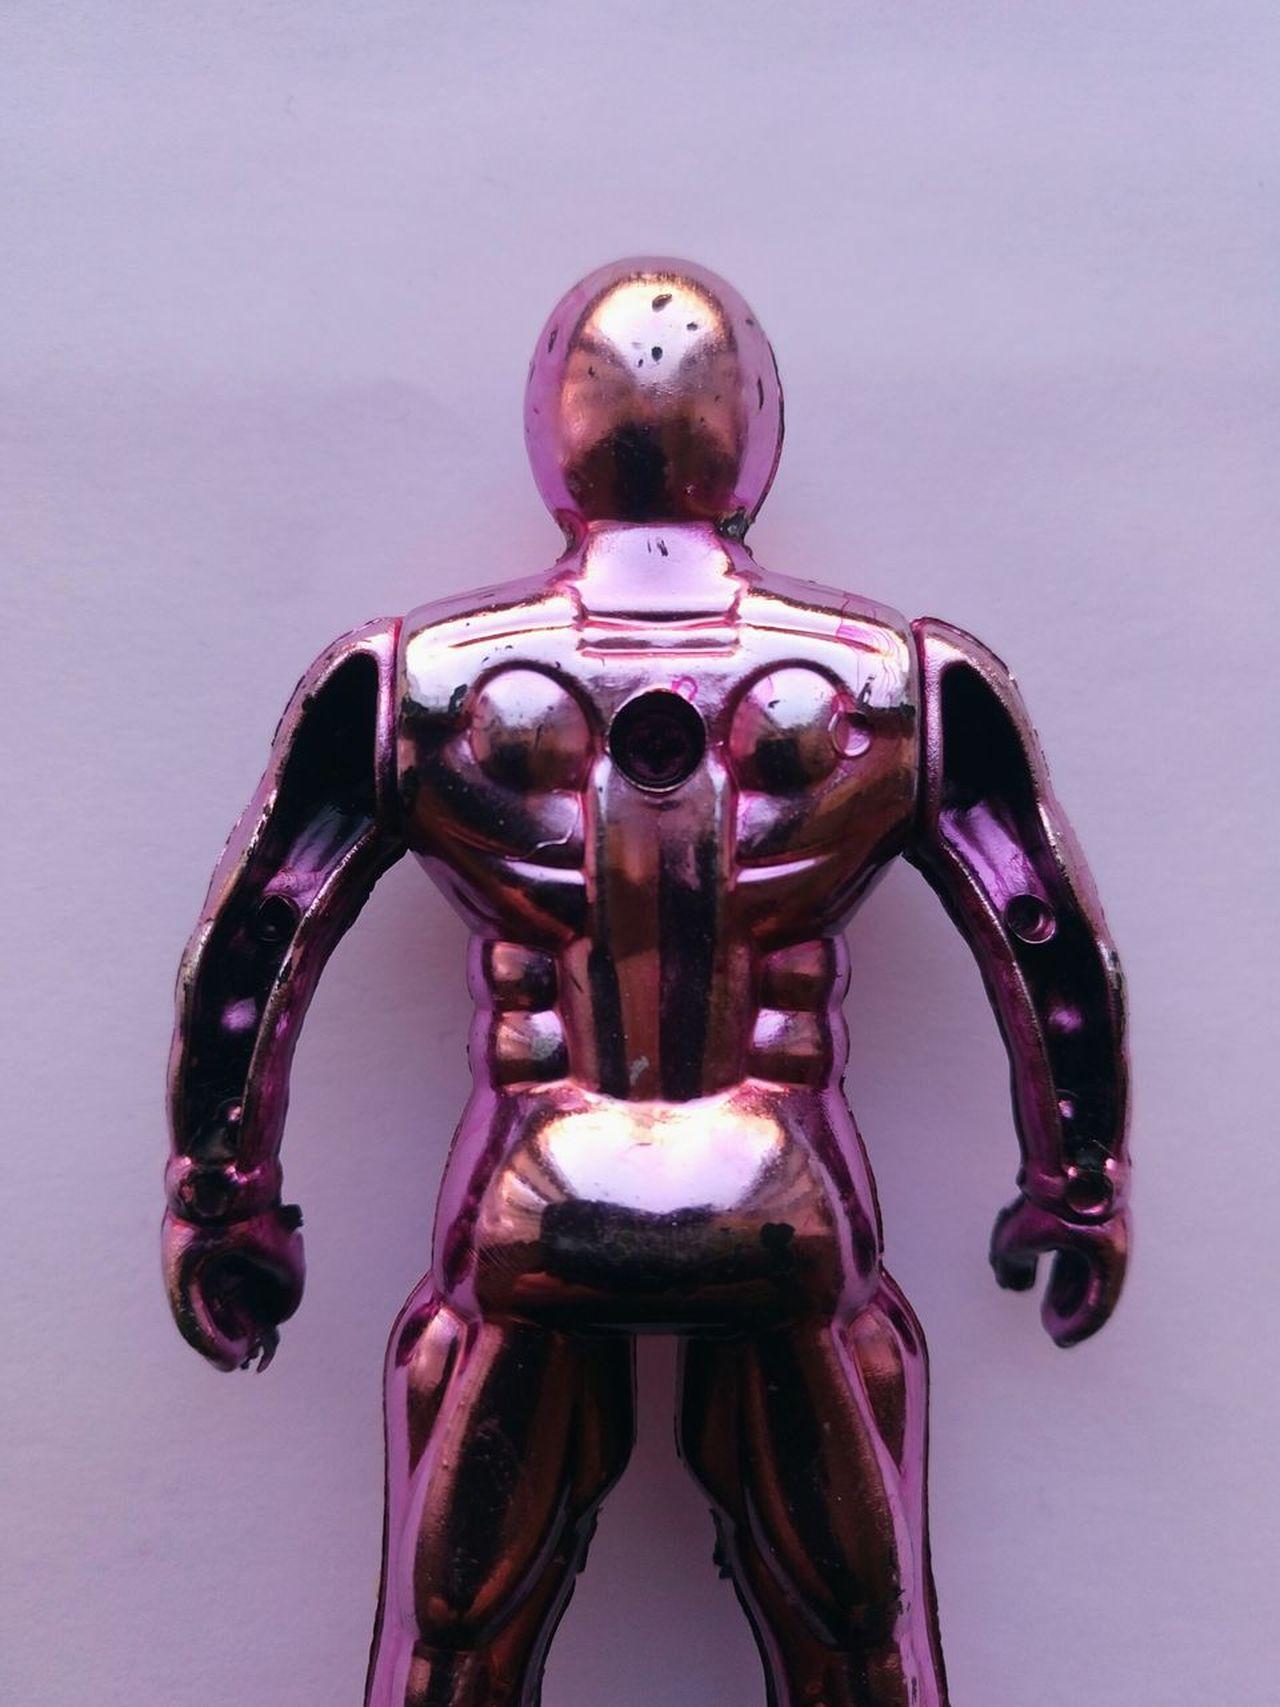 Robotsuit Close-up Colour Image Toy Toyphotography Figure Plasticfigure Superhero Robotman Iron Man Robots Robot Android Toyfigures Pink Color